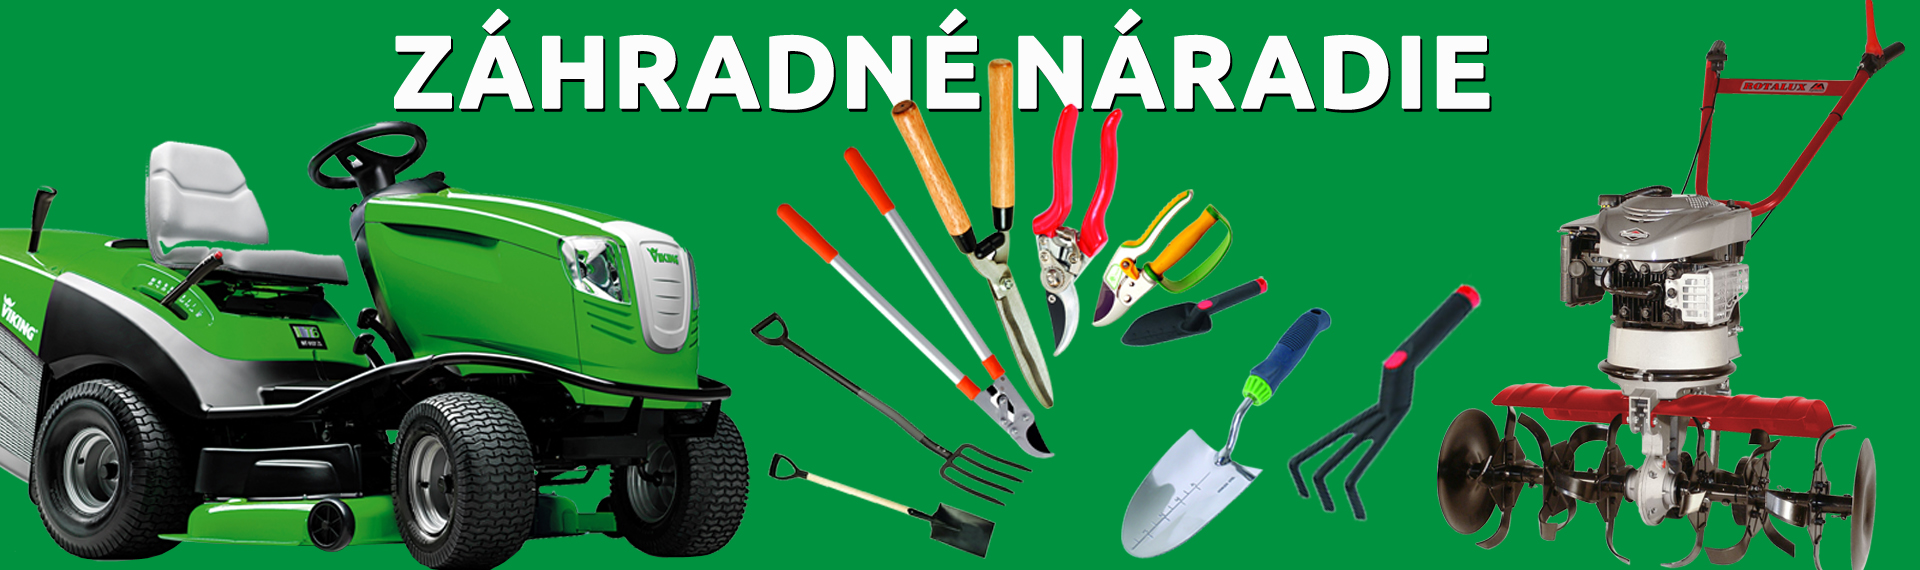 Zahradne_naradie_nivo_slider.jpg